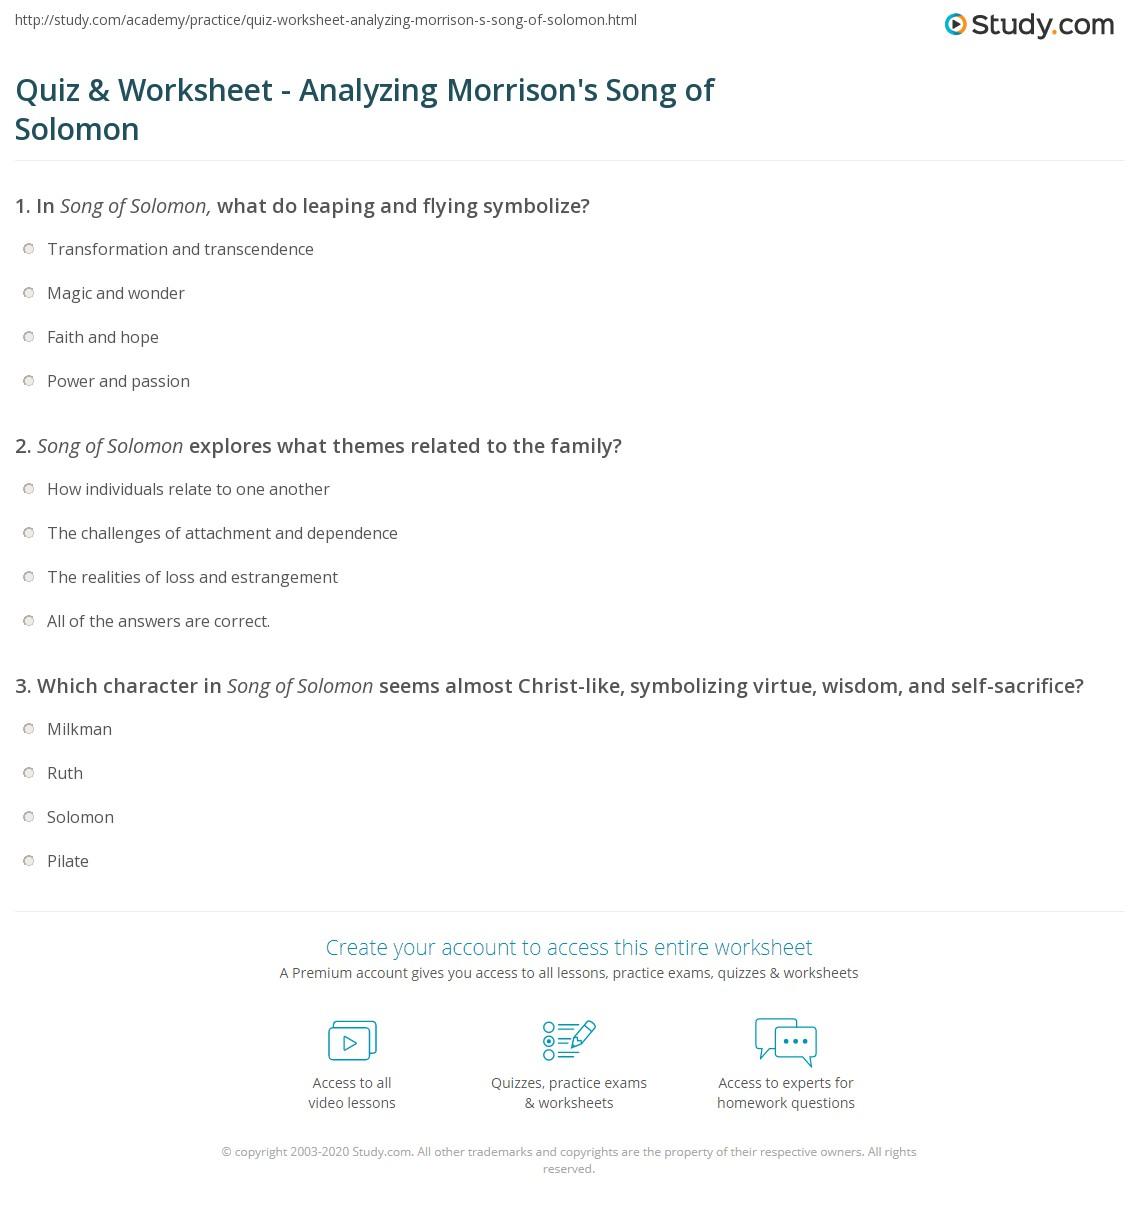 Worksheets Song Analysis Worksheet quiz worksheet analyzing morrisons song of solomon study com print by toni morrison themes analysis worksheet